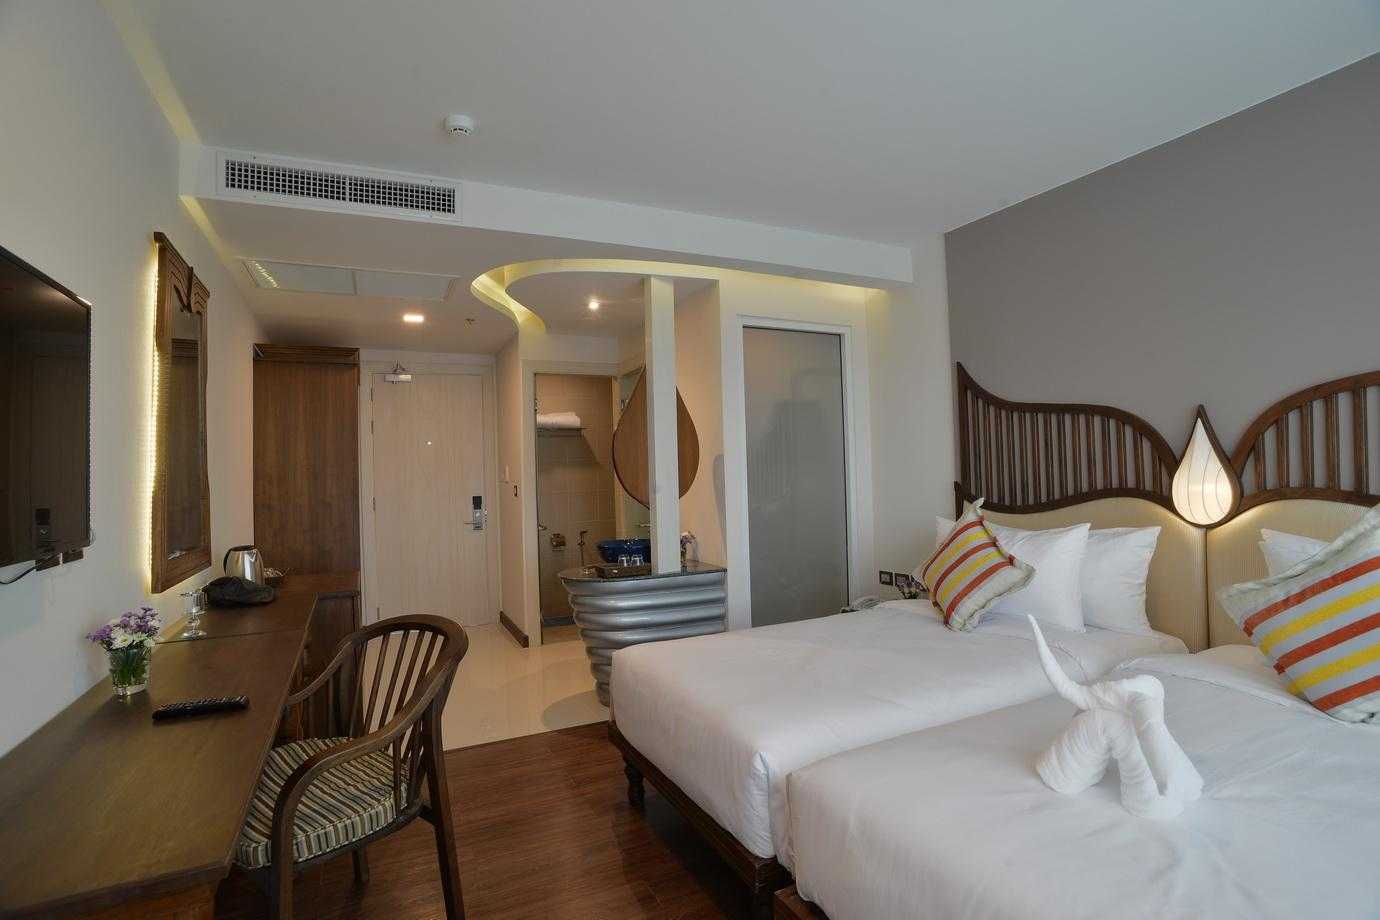 Baisirimaya Hotel,โรงแรมบายสิริมายา